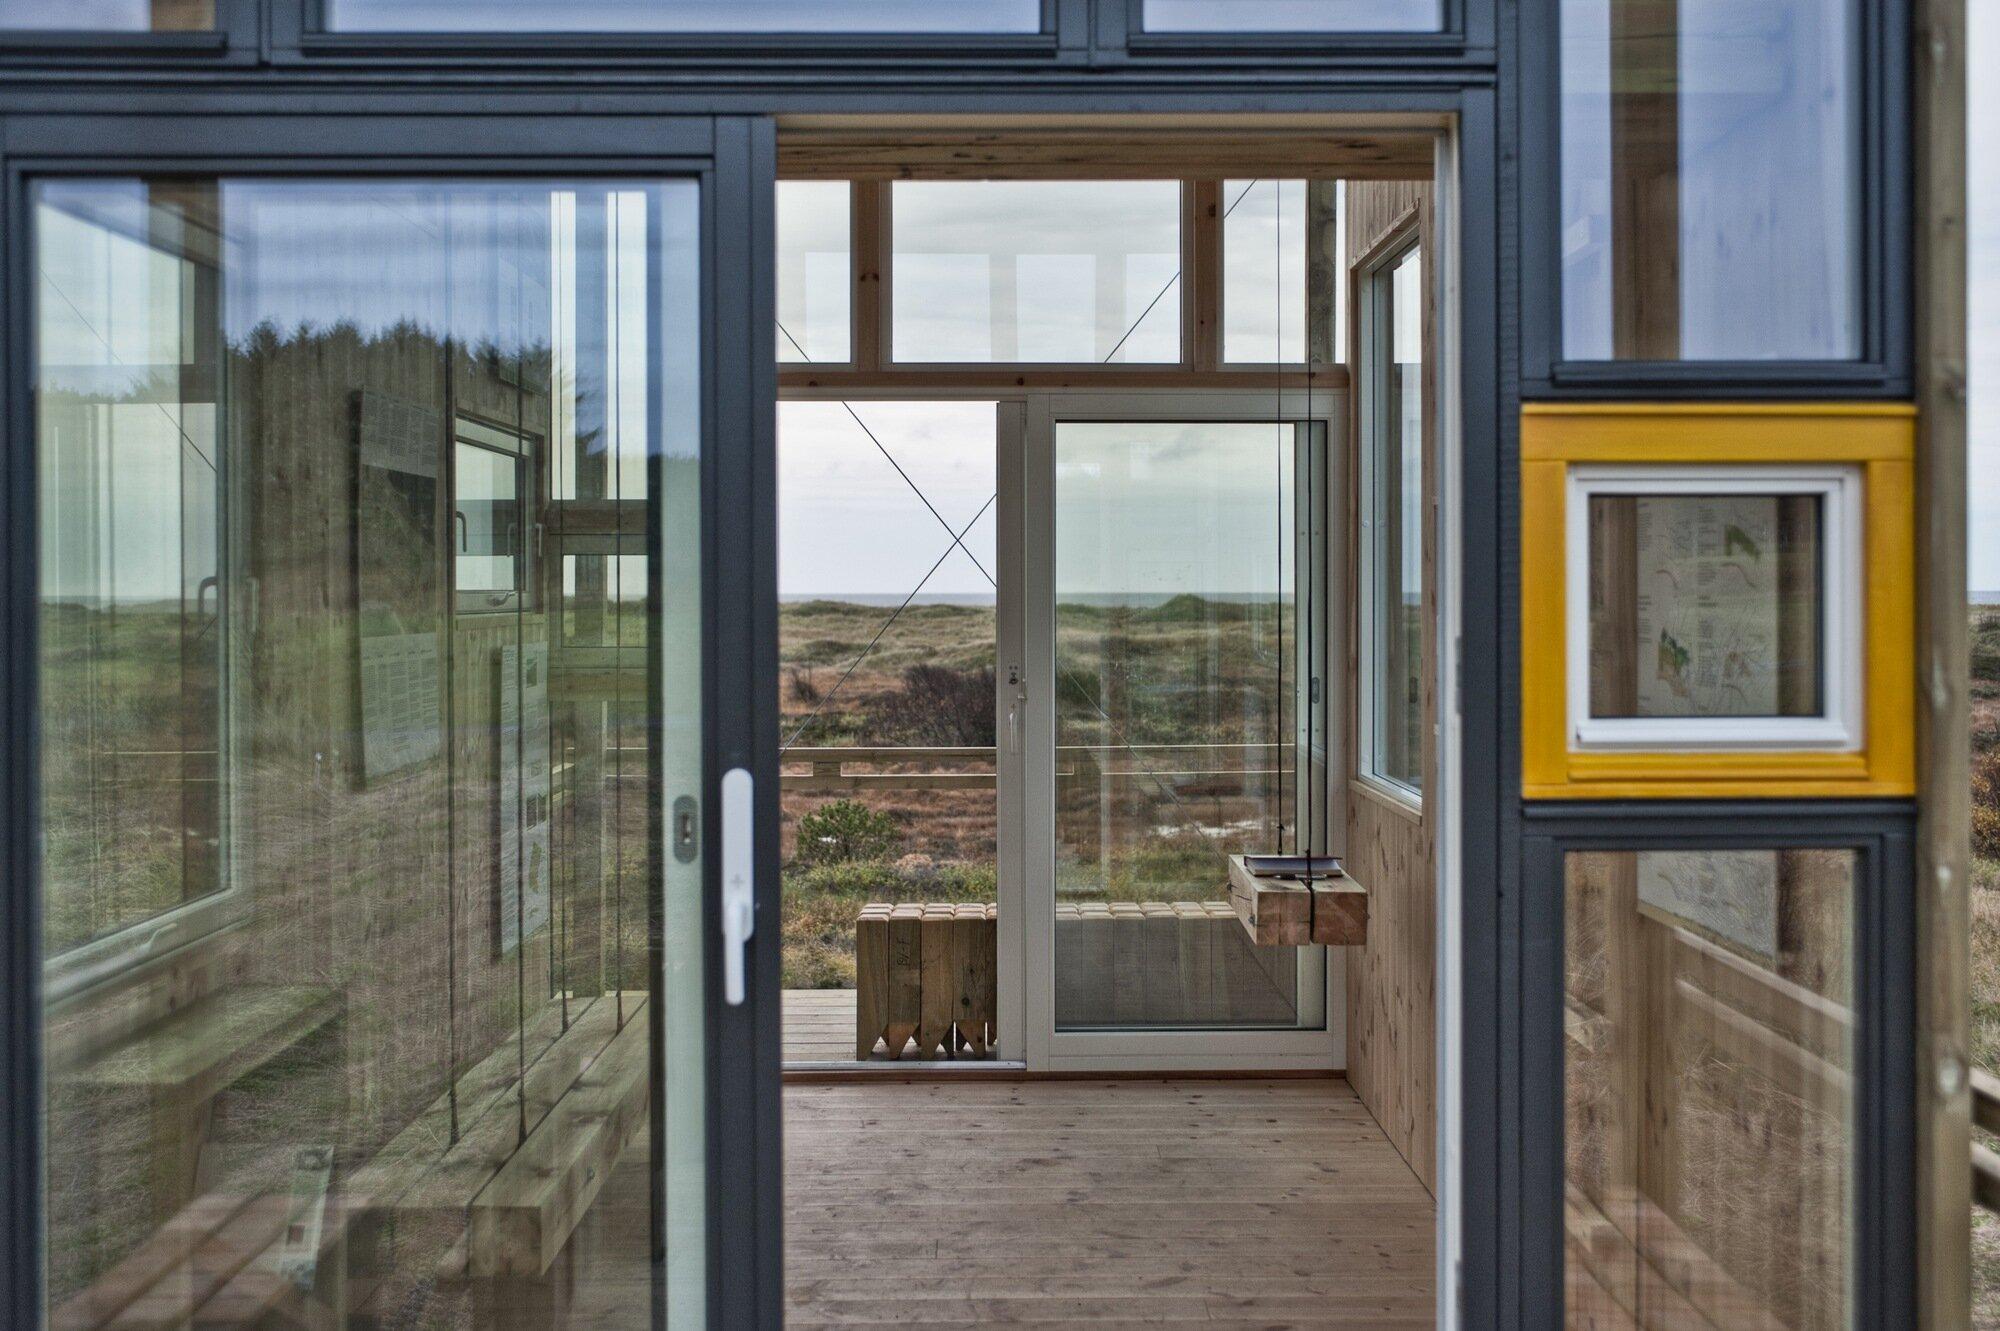 Lyset Paa Lista - TYIN Tegnestue - Norway - Window Detail - Humble Homes